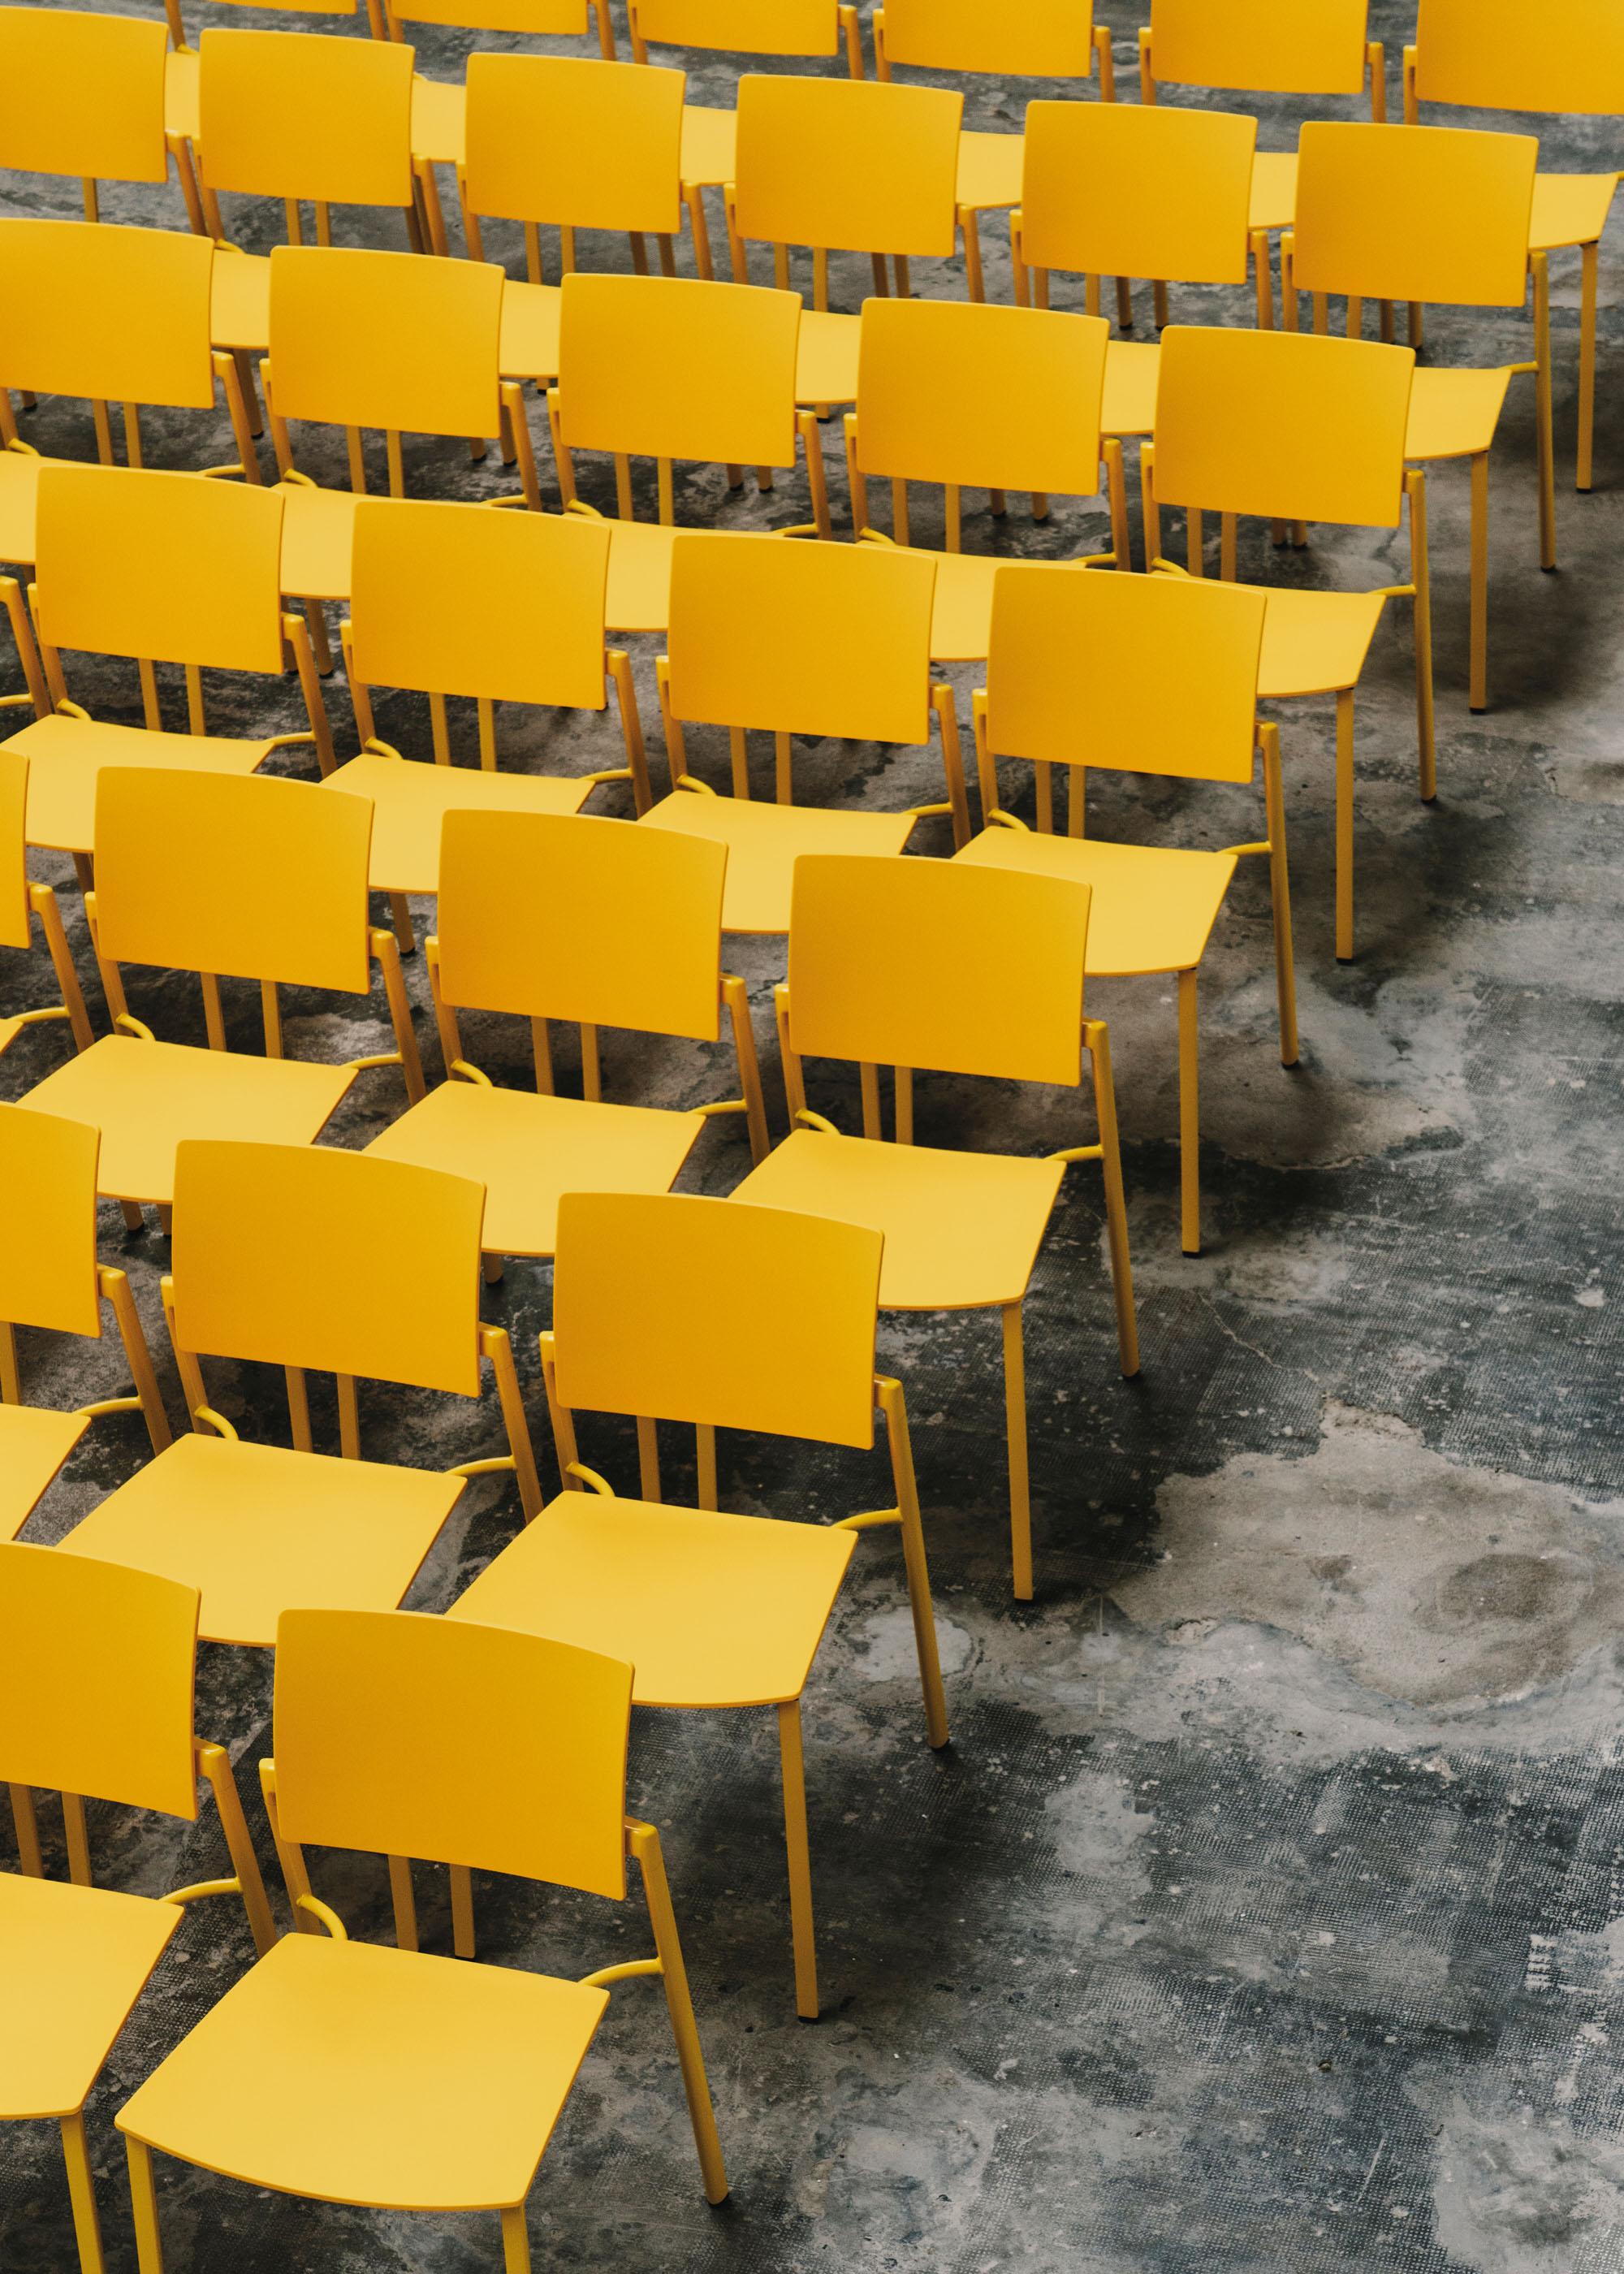 #furniture #enea #design #clase #chairs #yellow #basque #fronton